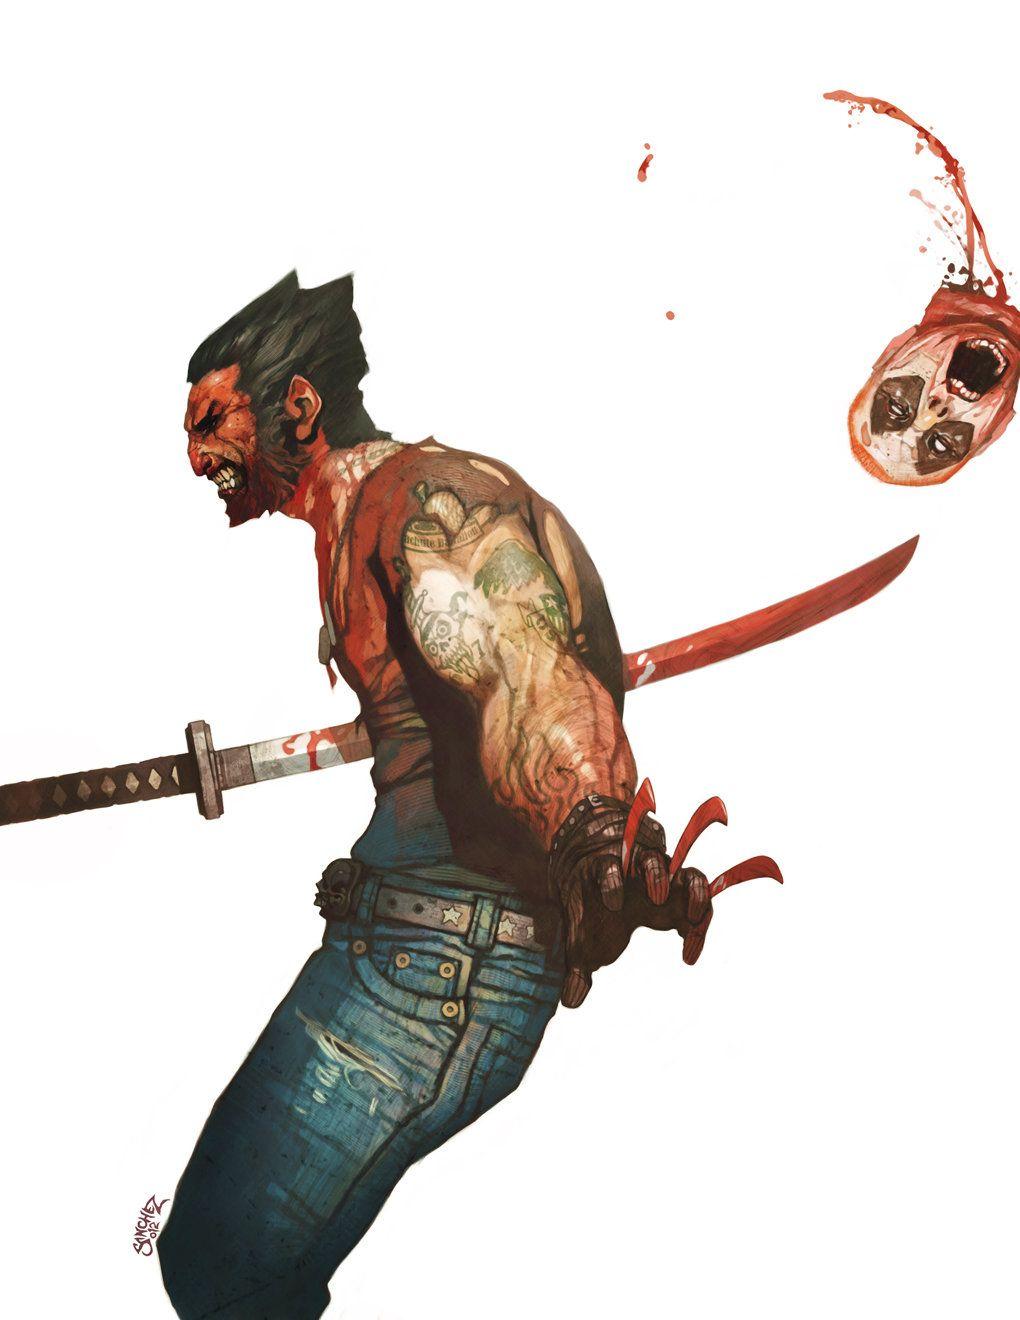 ArtStation - Wolverine vs. Deadpool, Reynan Sanchez